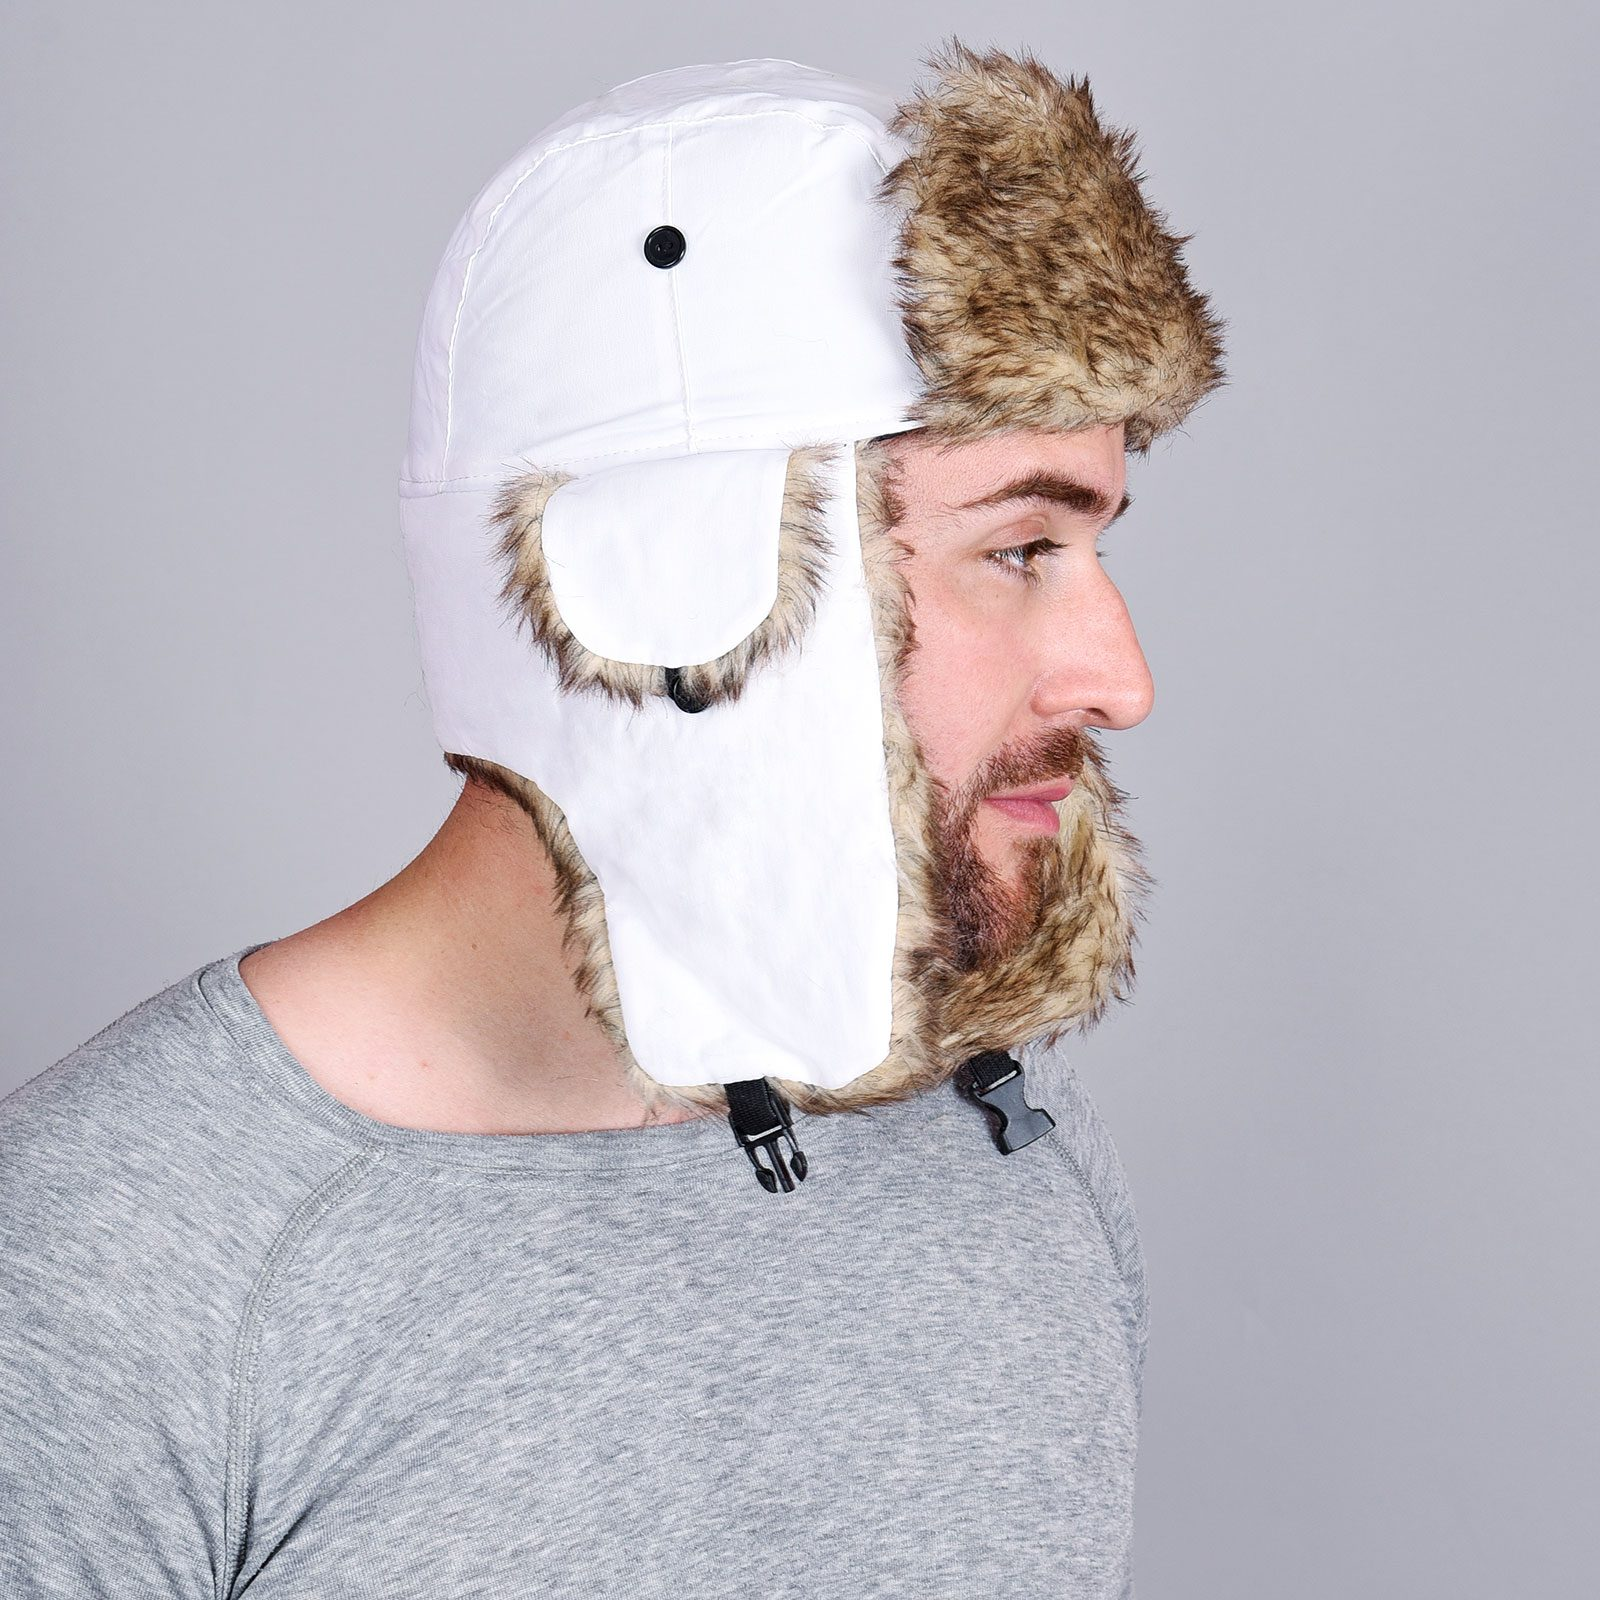 http://lookbook.allee-du-foulard.fr/wp-content/uploads/2018/11/CP-00136-VH16-1-chapka-homme-blanc-1600x1600.jpg